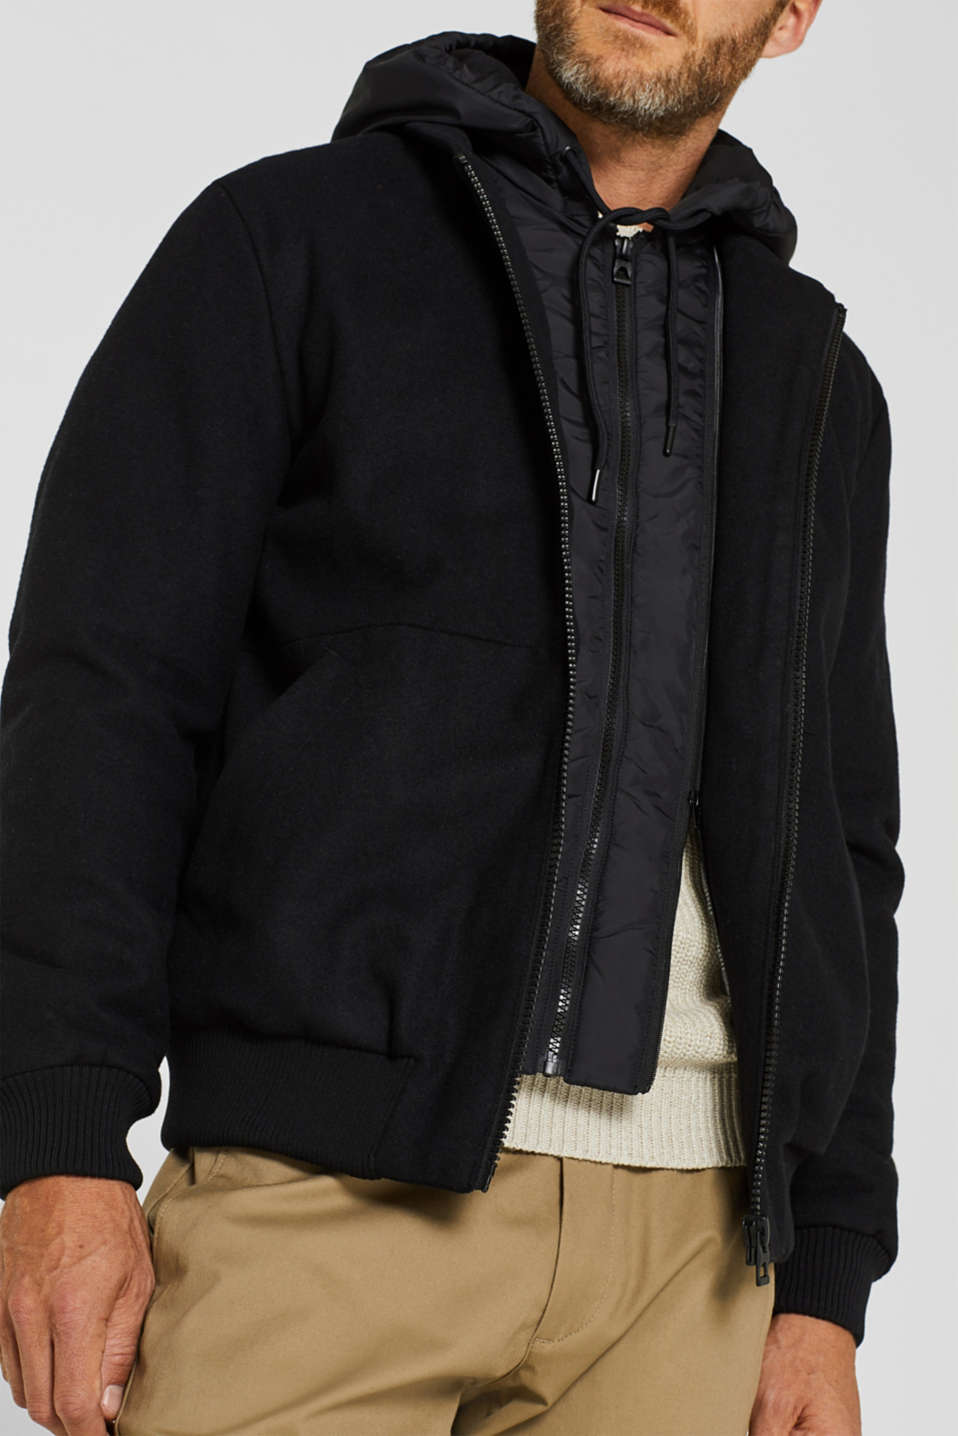 With wool: Jacket with adjustable hood, BLACK, detail image number 4